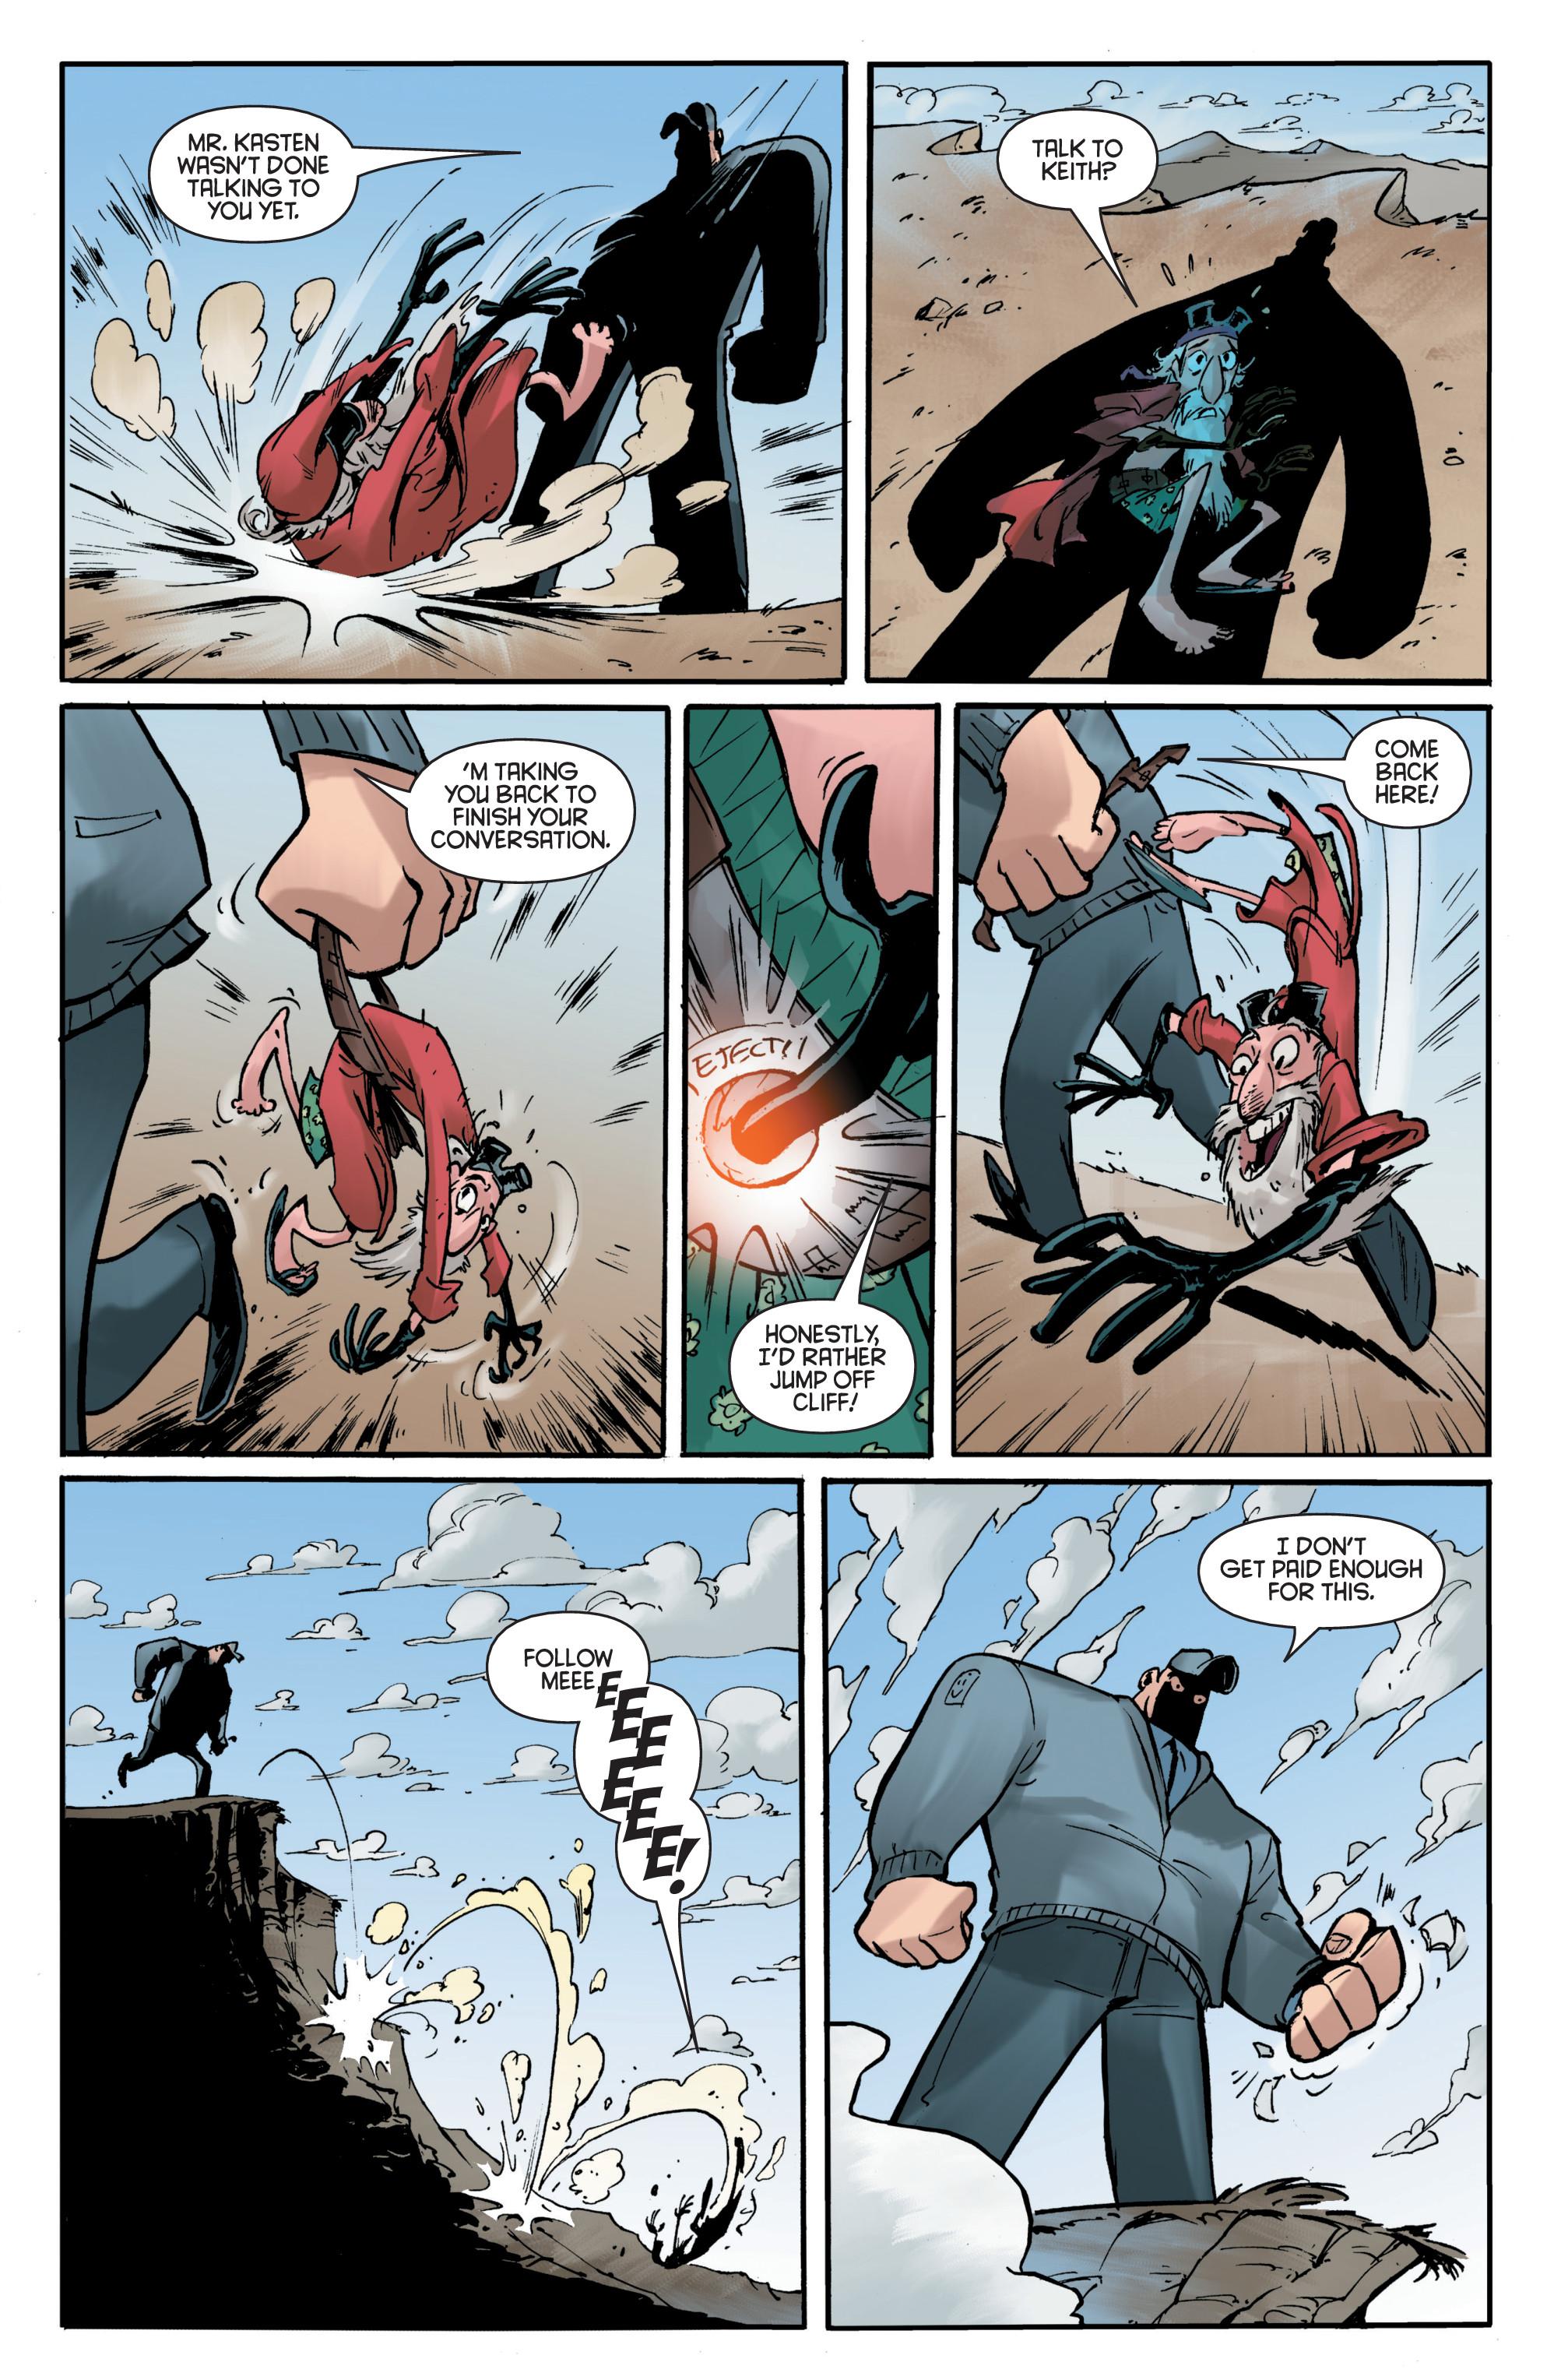 Read online Smosh comic -  Issue #5 - 21